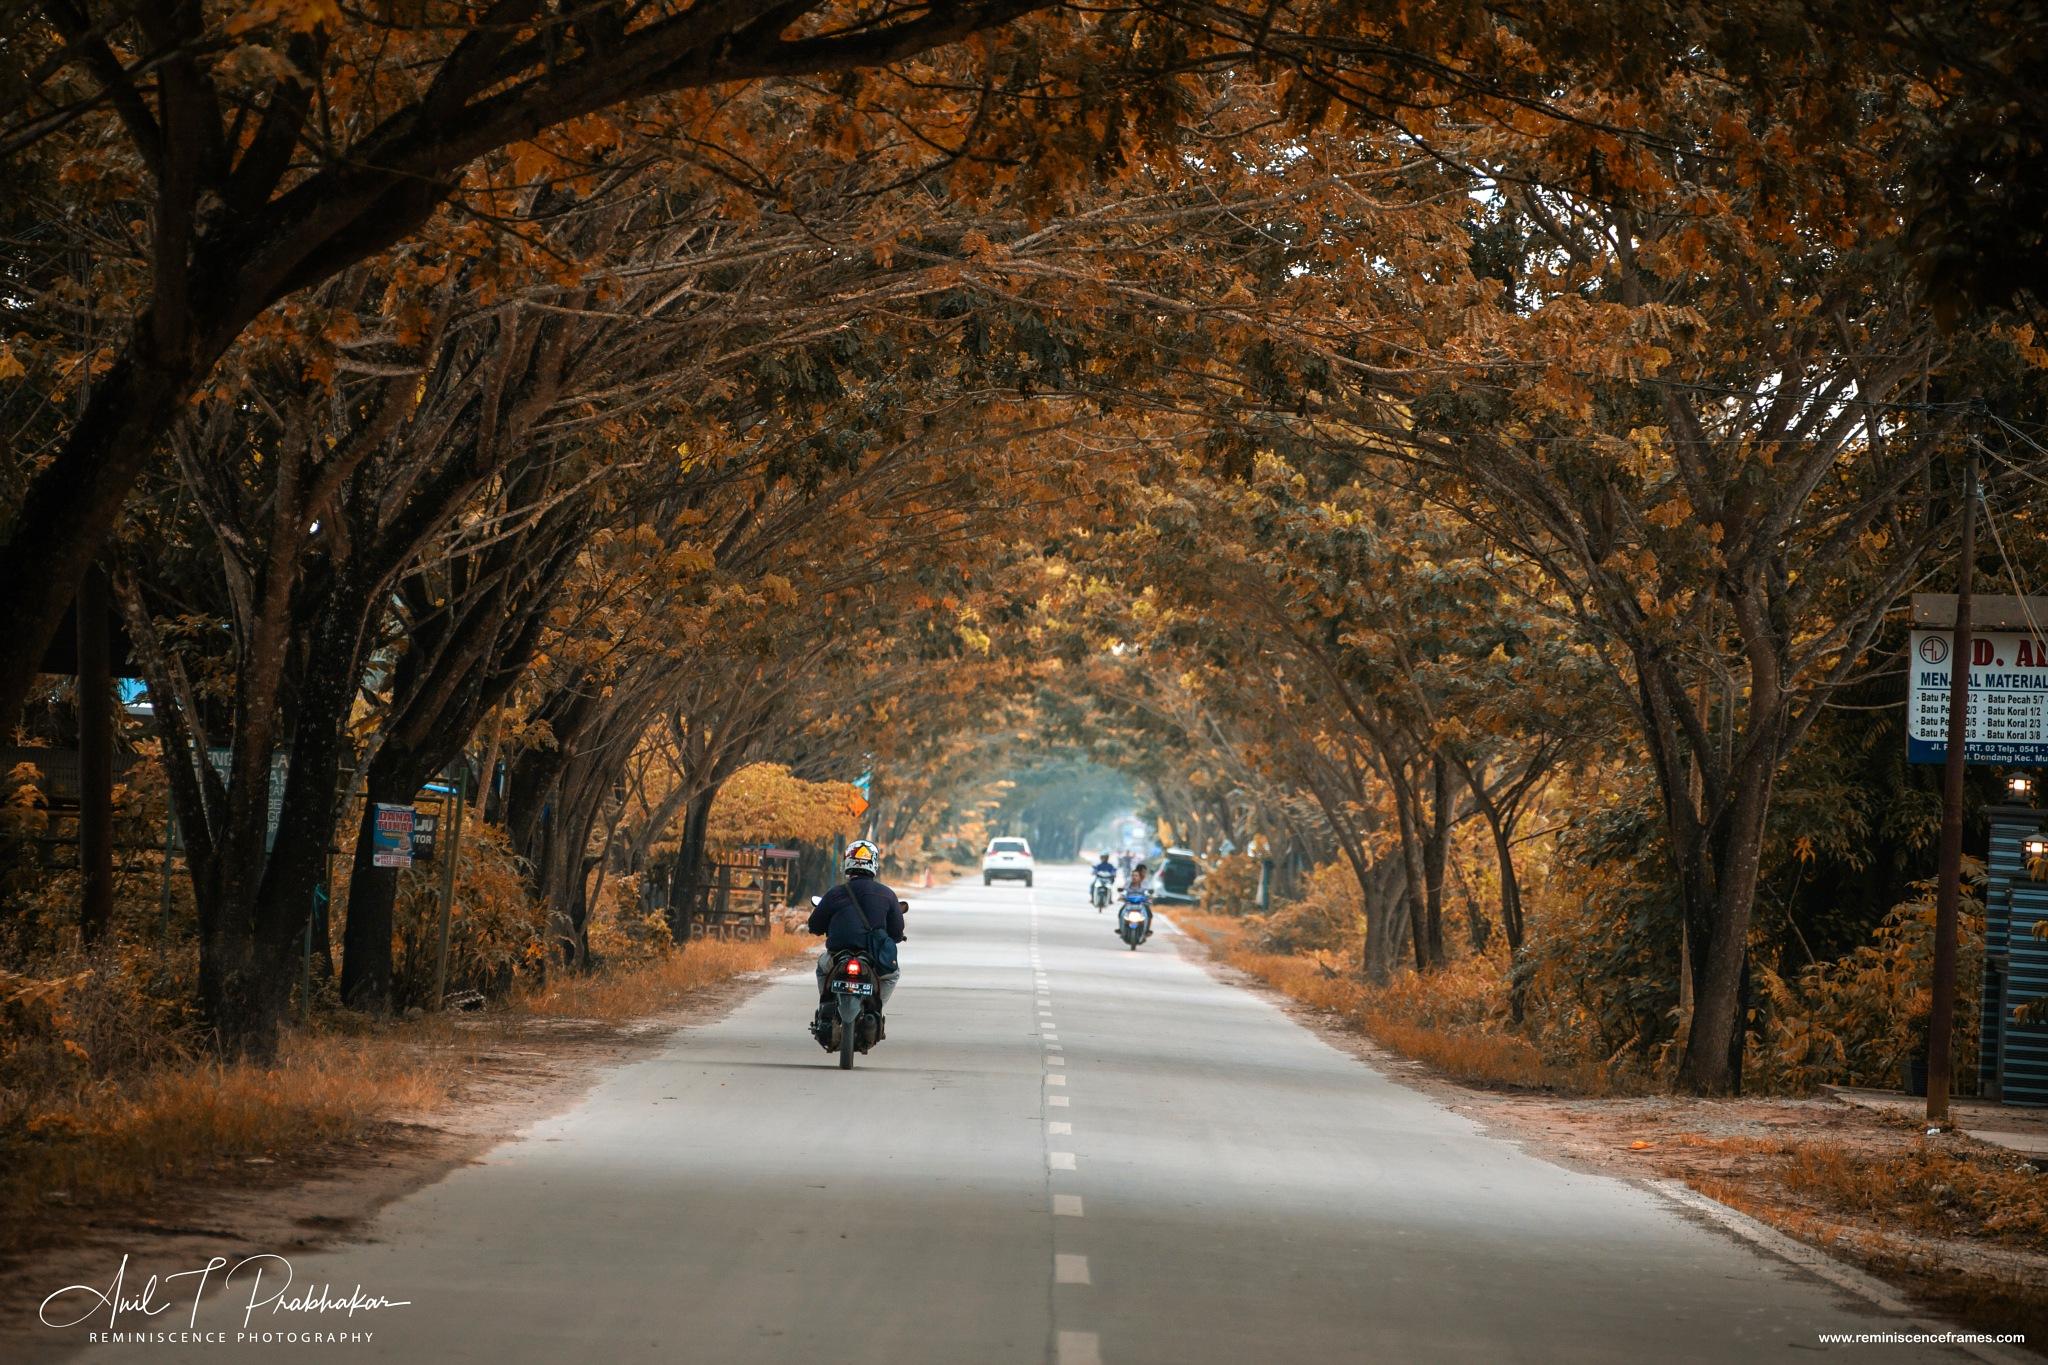 The Road  by Anil T Prabhakar